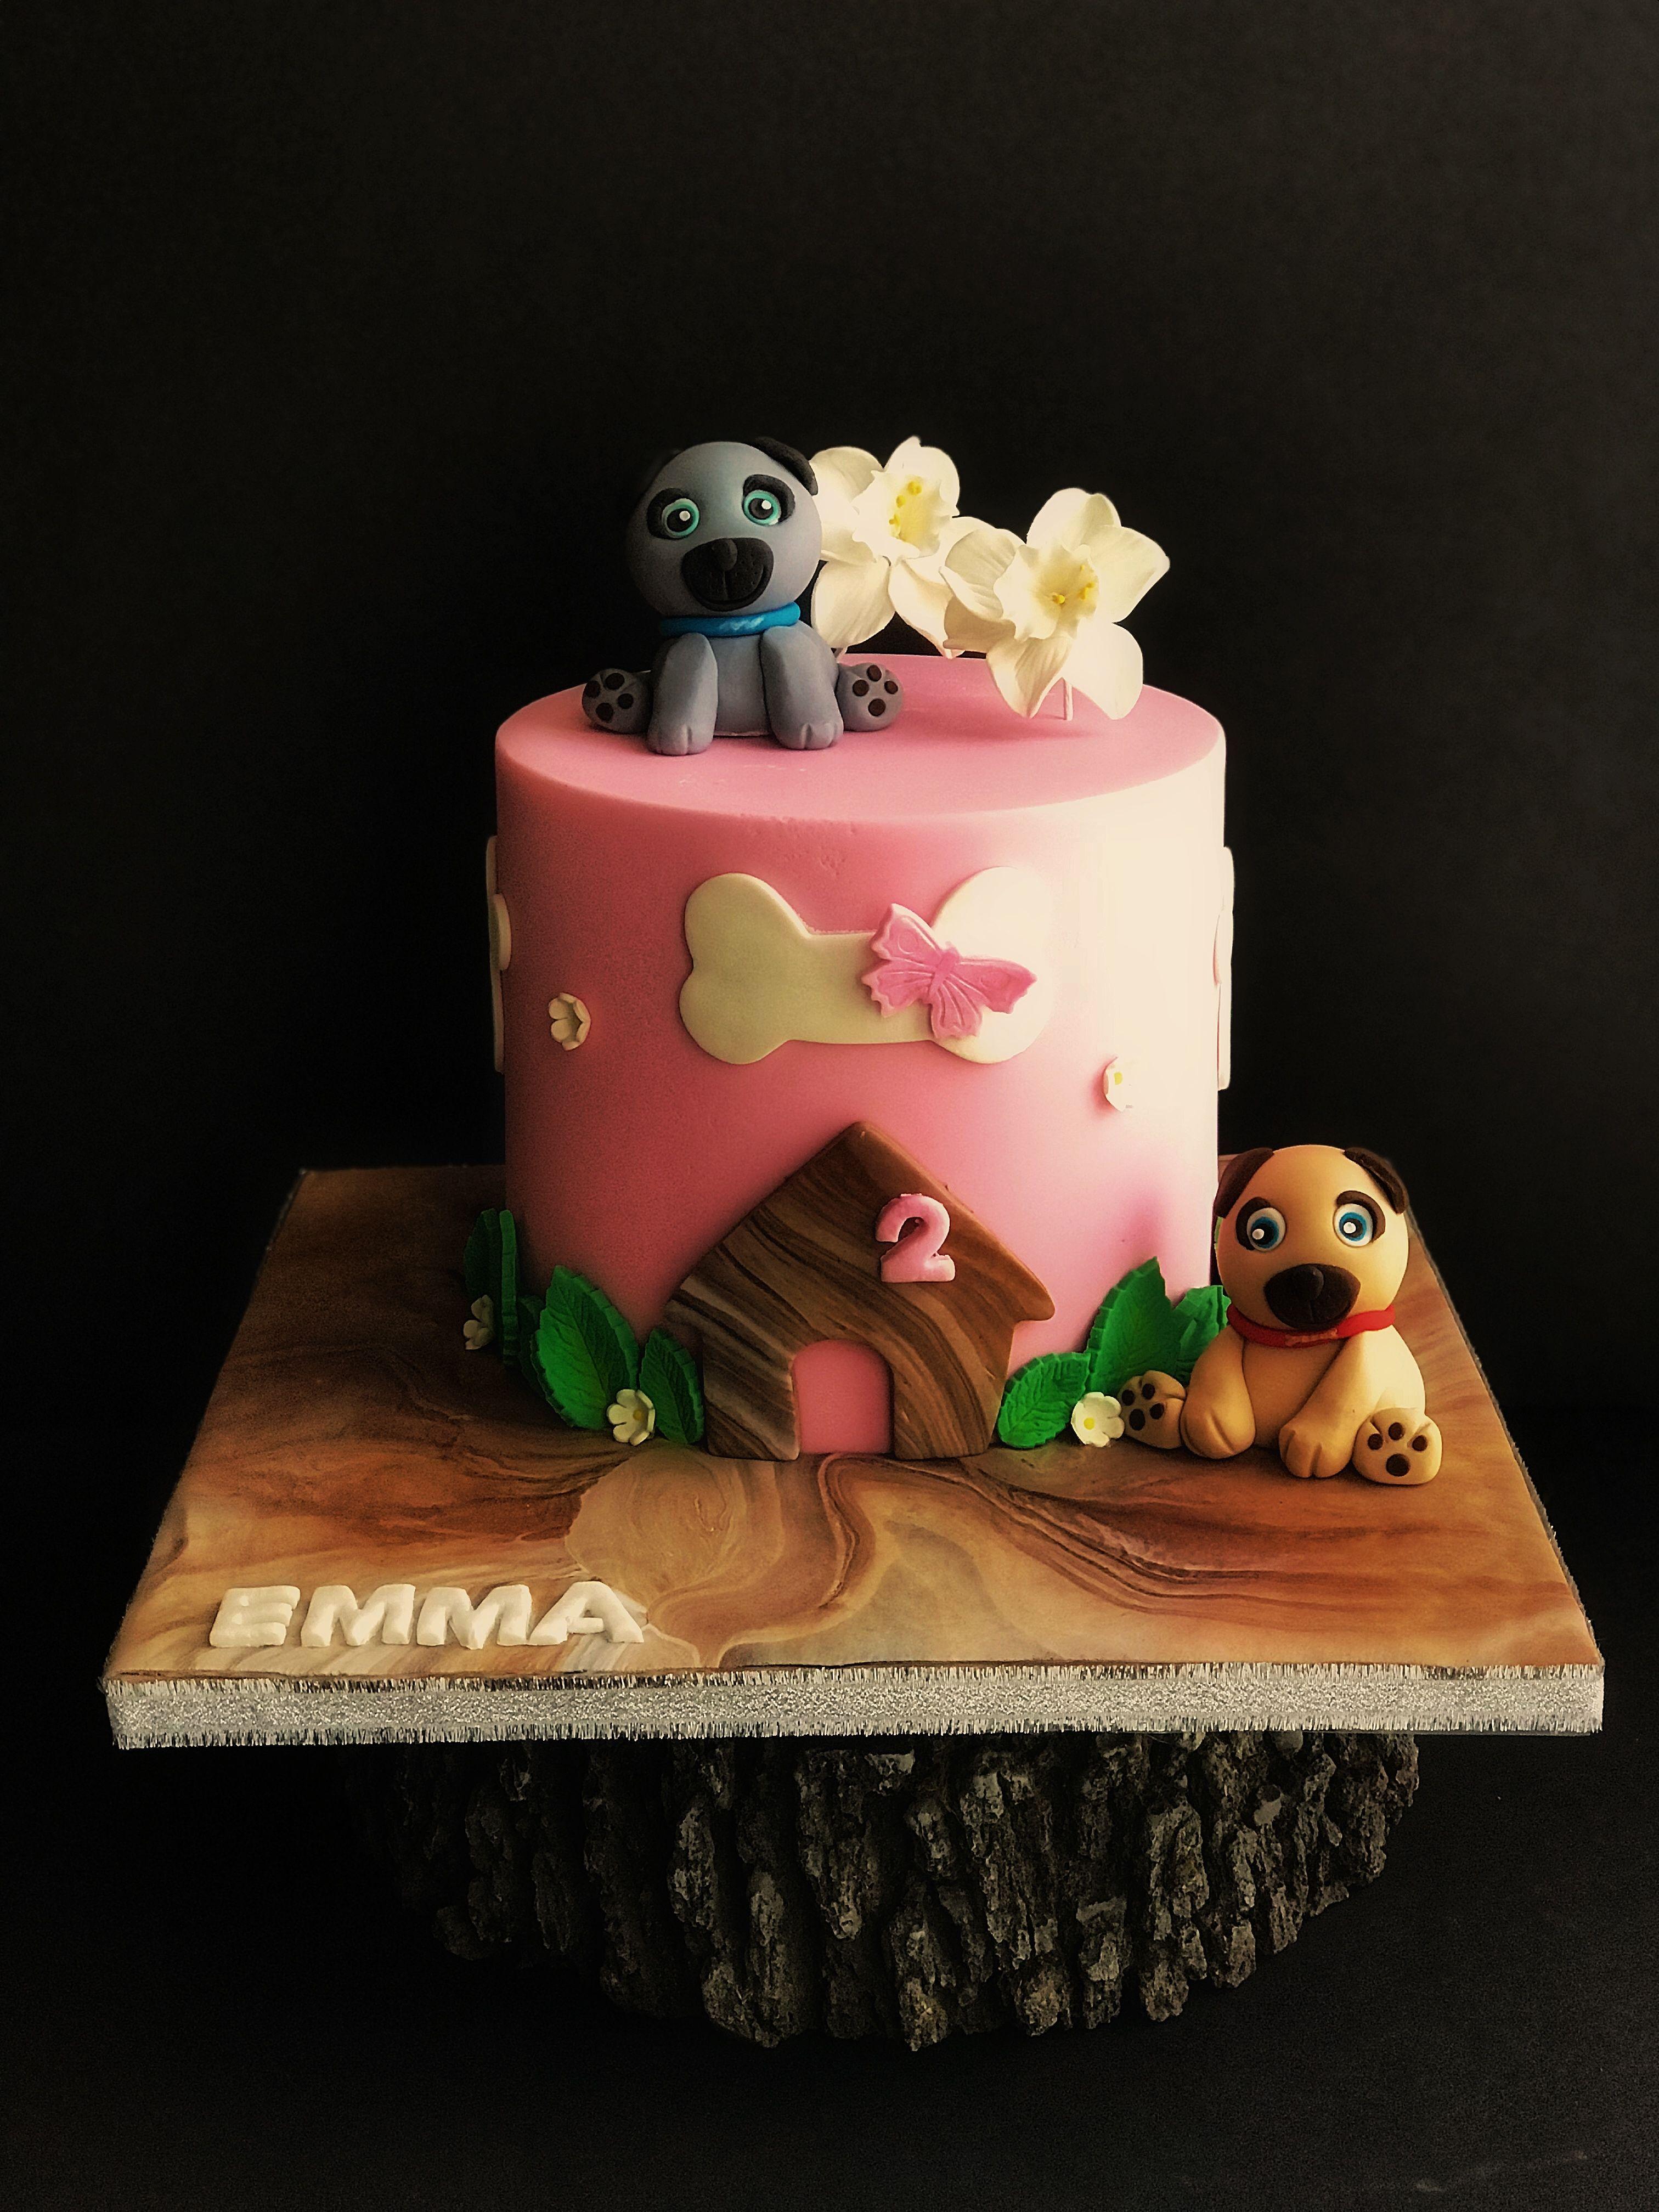 Puppy Dog Pals Cake With Images Birthday Cake Girls